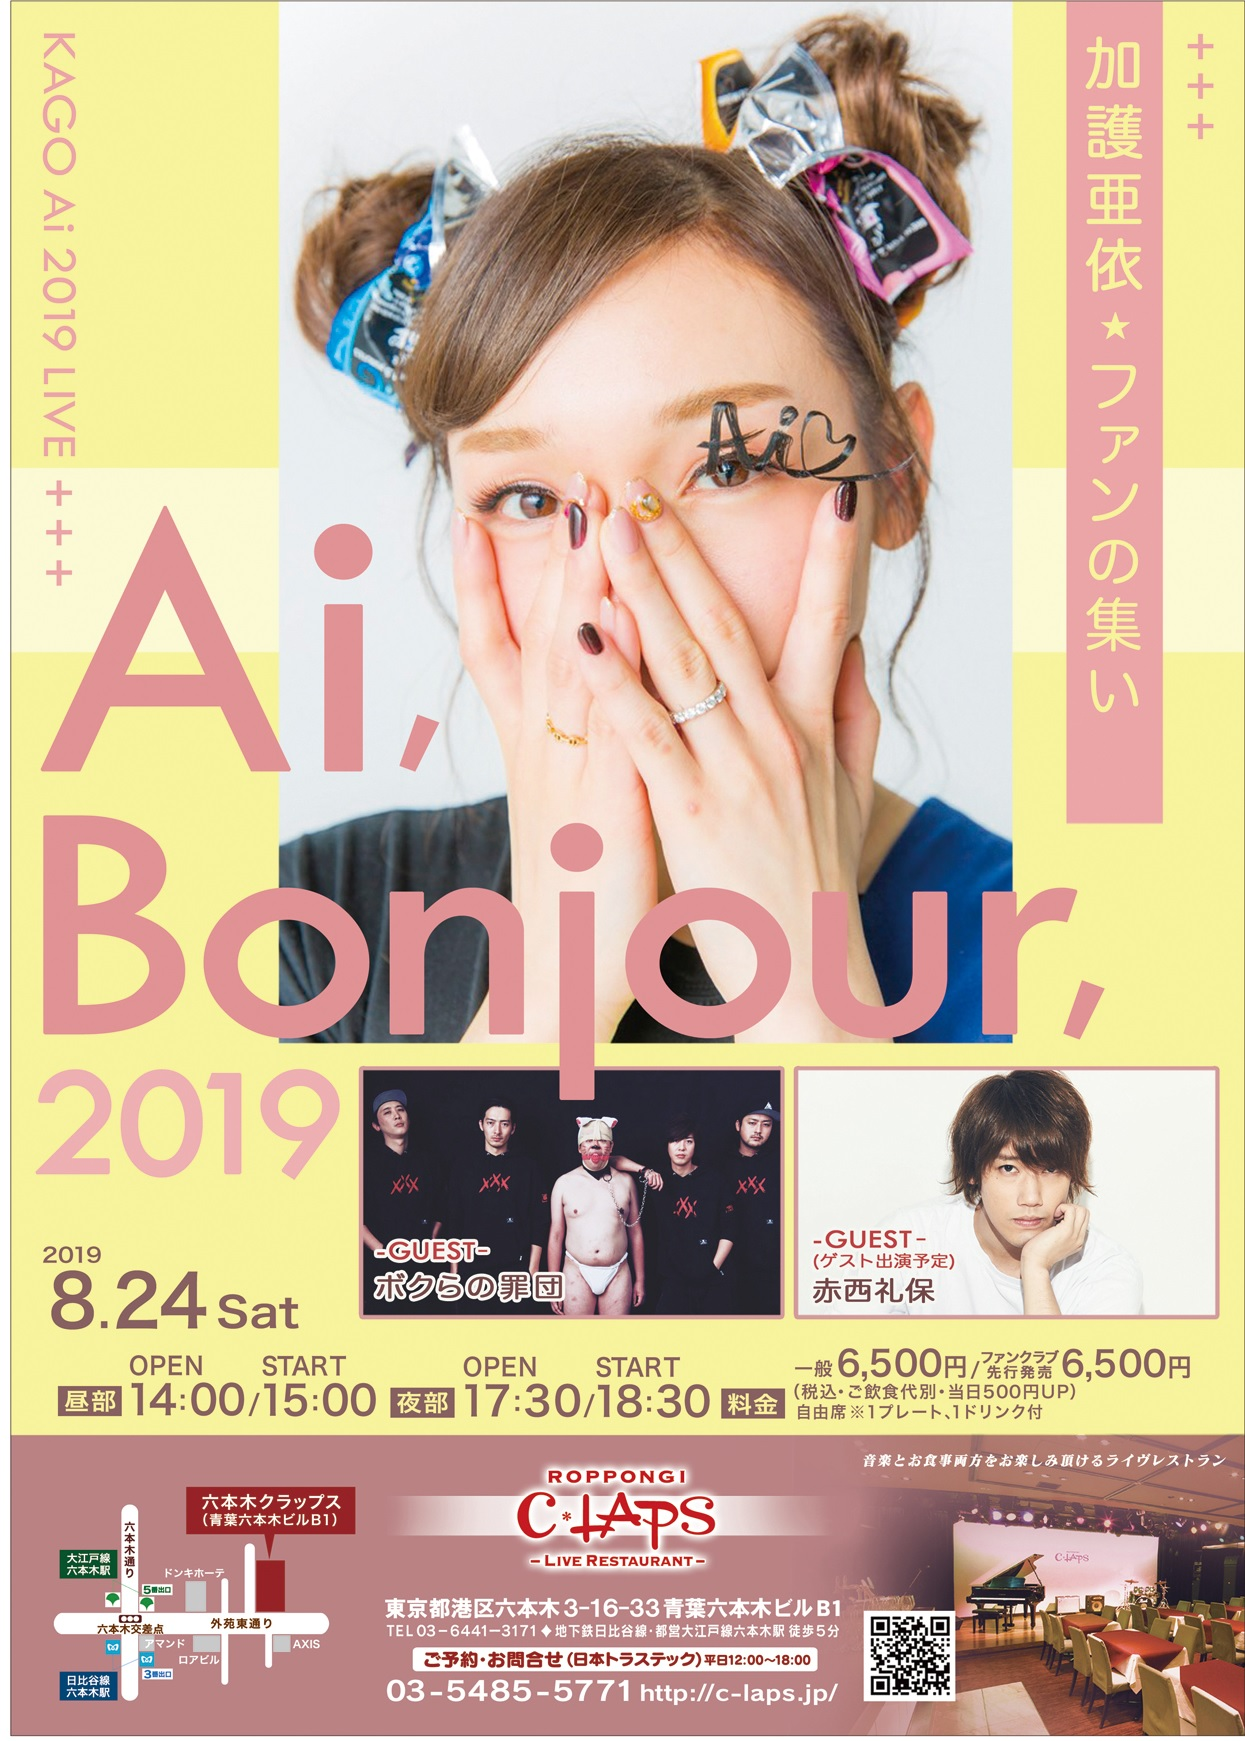 Ai,Bonjour,2019 加護亜依★ファンの集い【夜部】